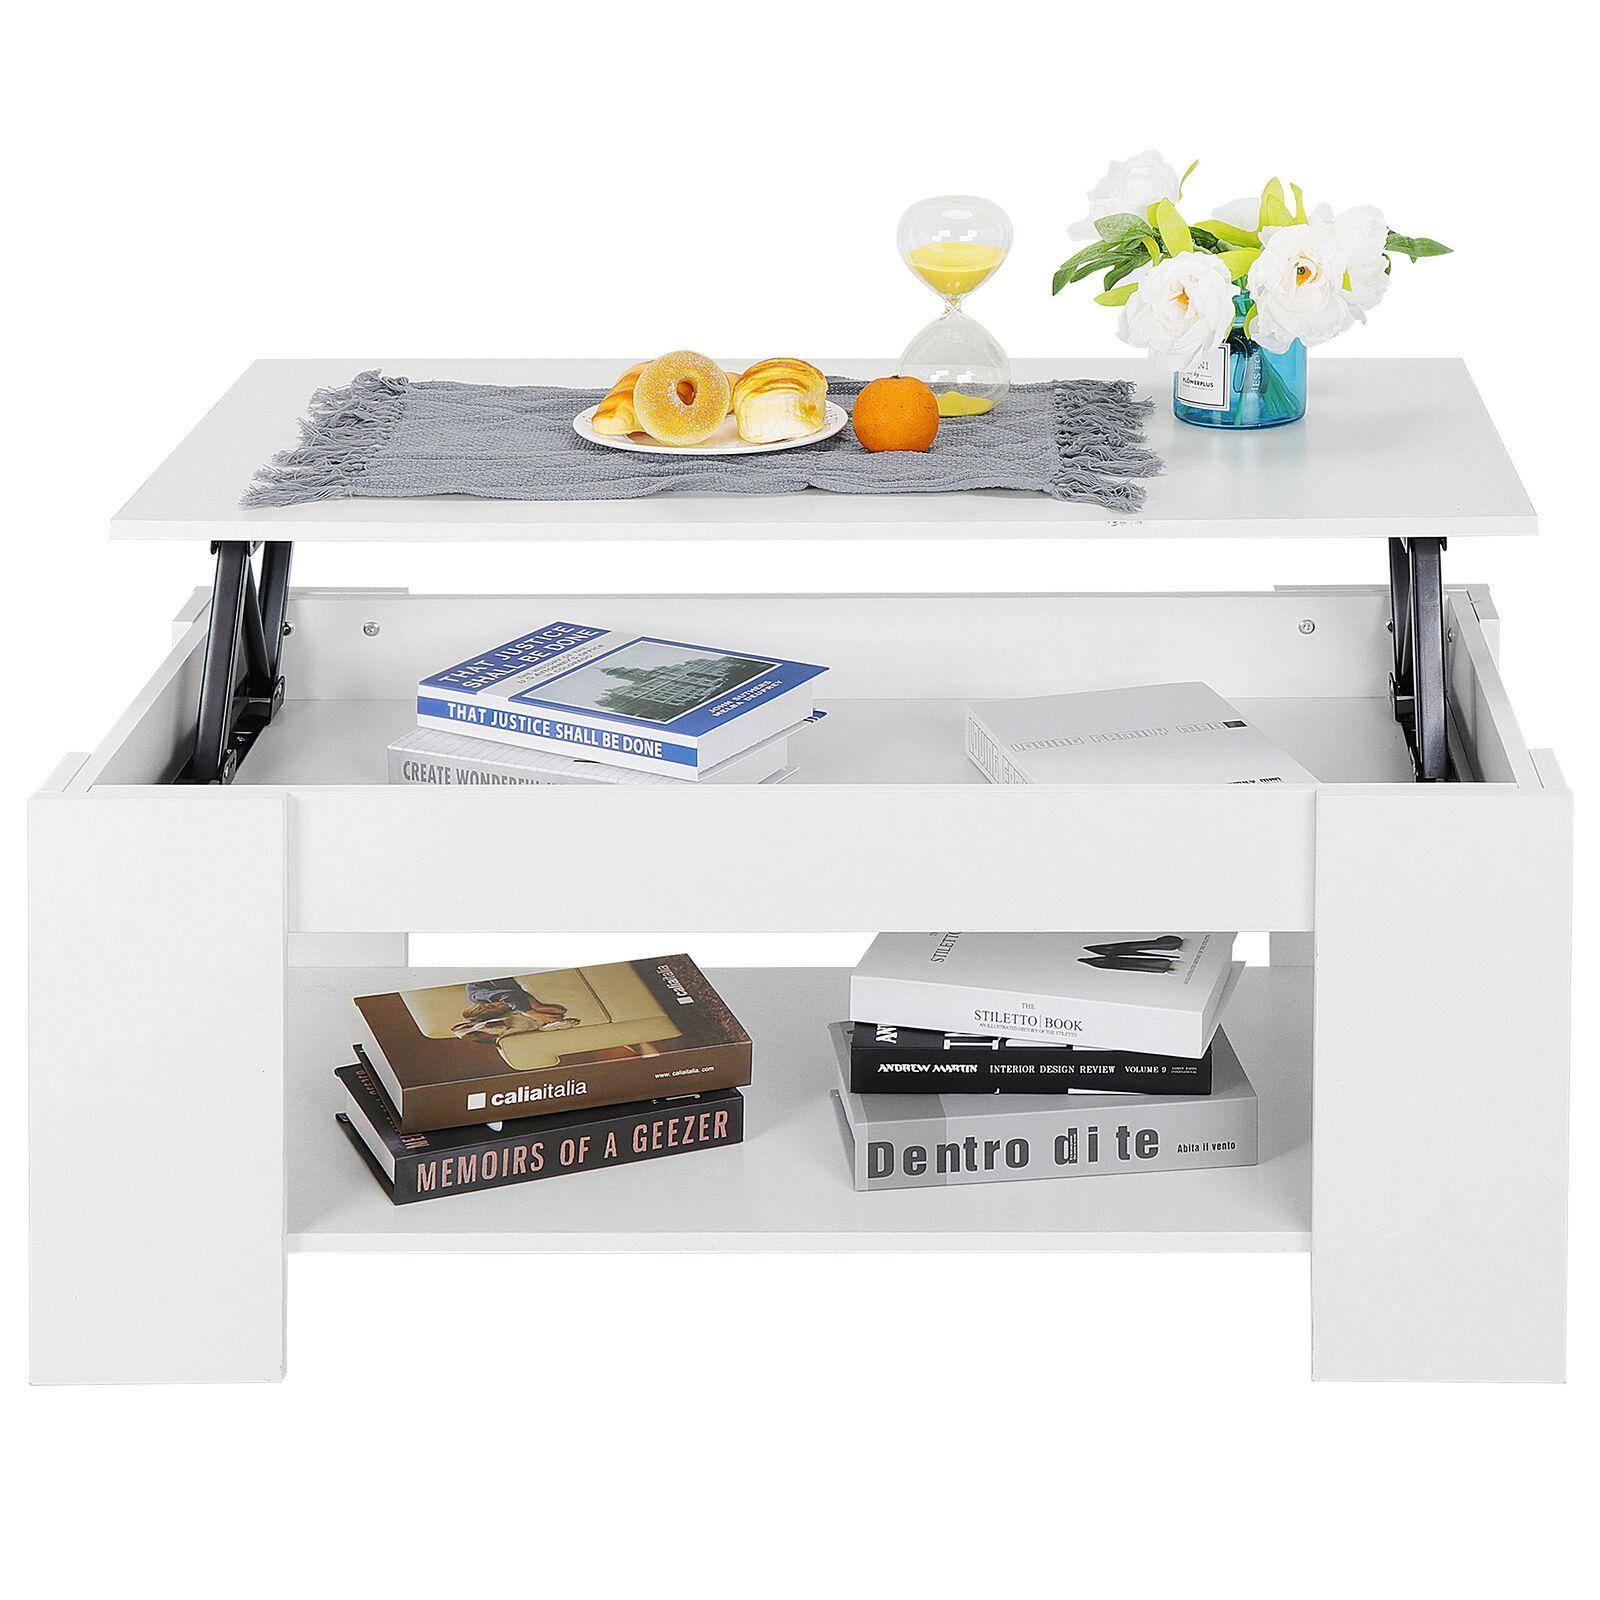 Lift Up Top Coffee Table Mechanism Furniture Laptop Storage Shelves Living Room Ebay In 2020 Living Room Coffee Table Coffee Table Living Room Table [ 1600 x 1600 Pixel ]